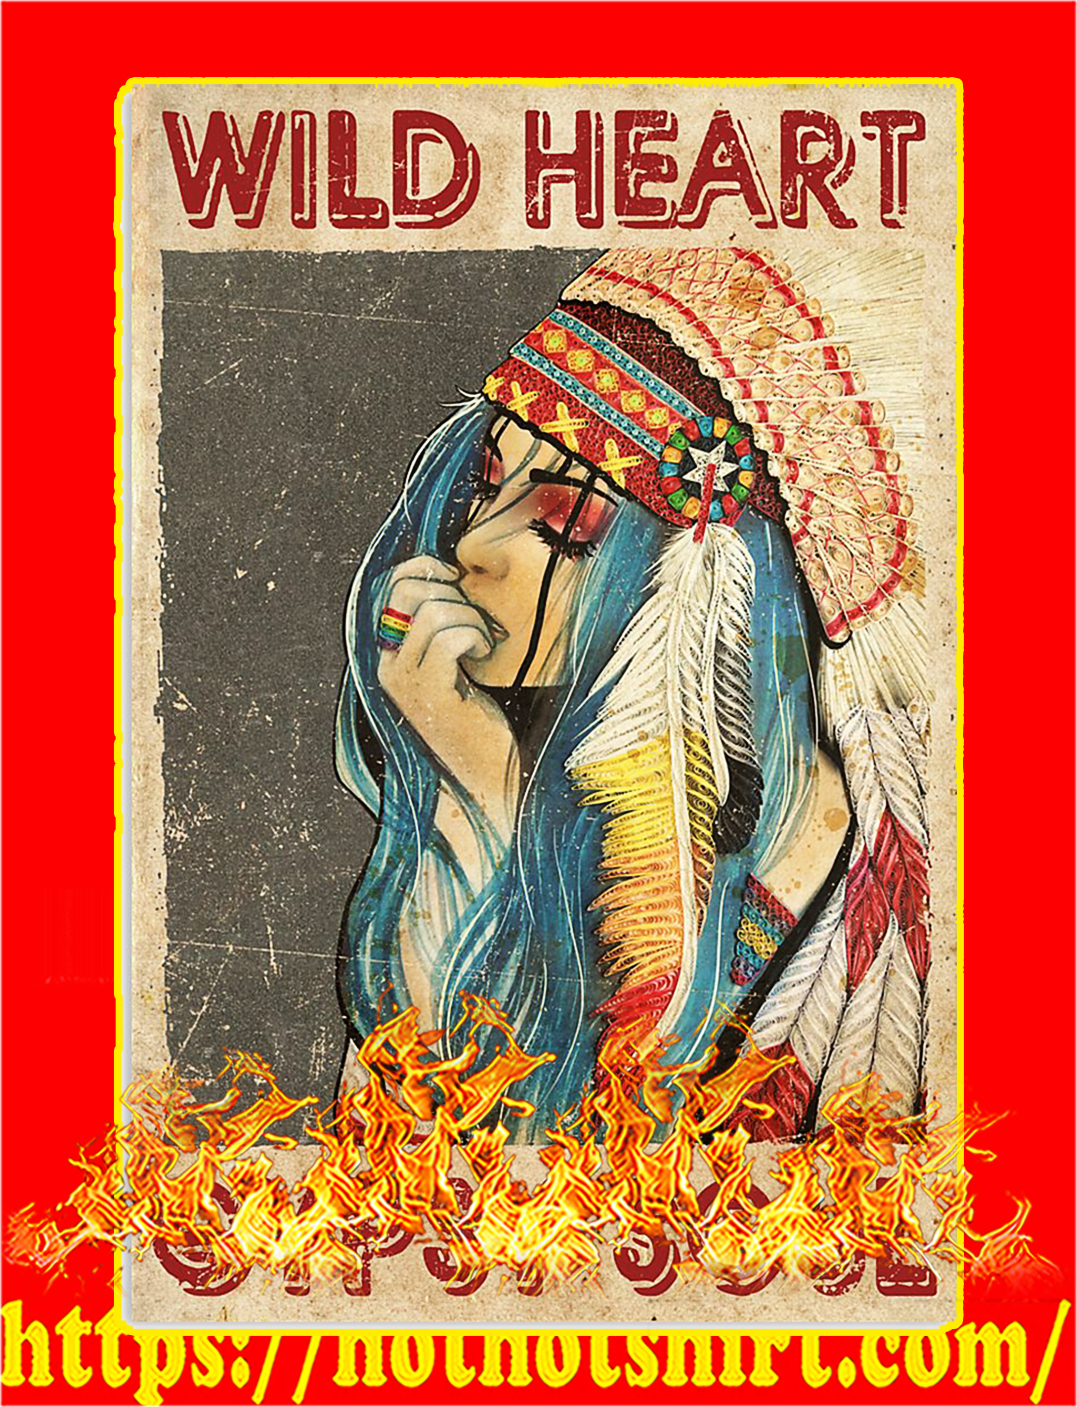 Wild heart gypsy soul poster - A3